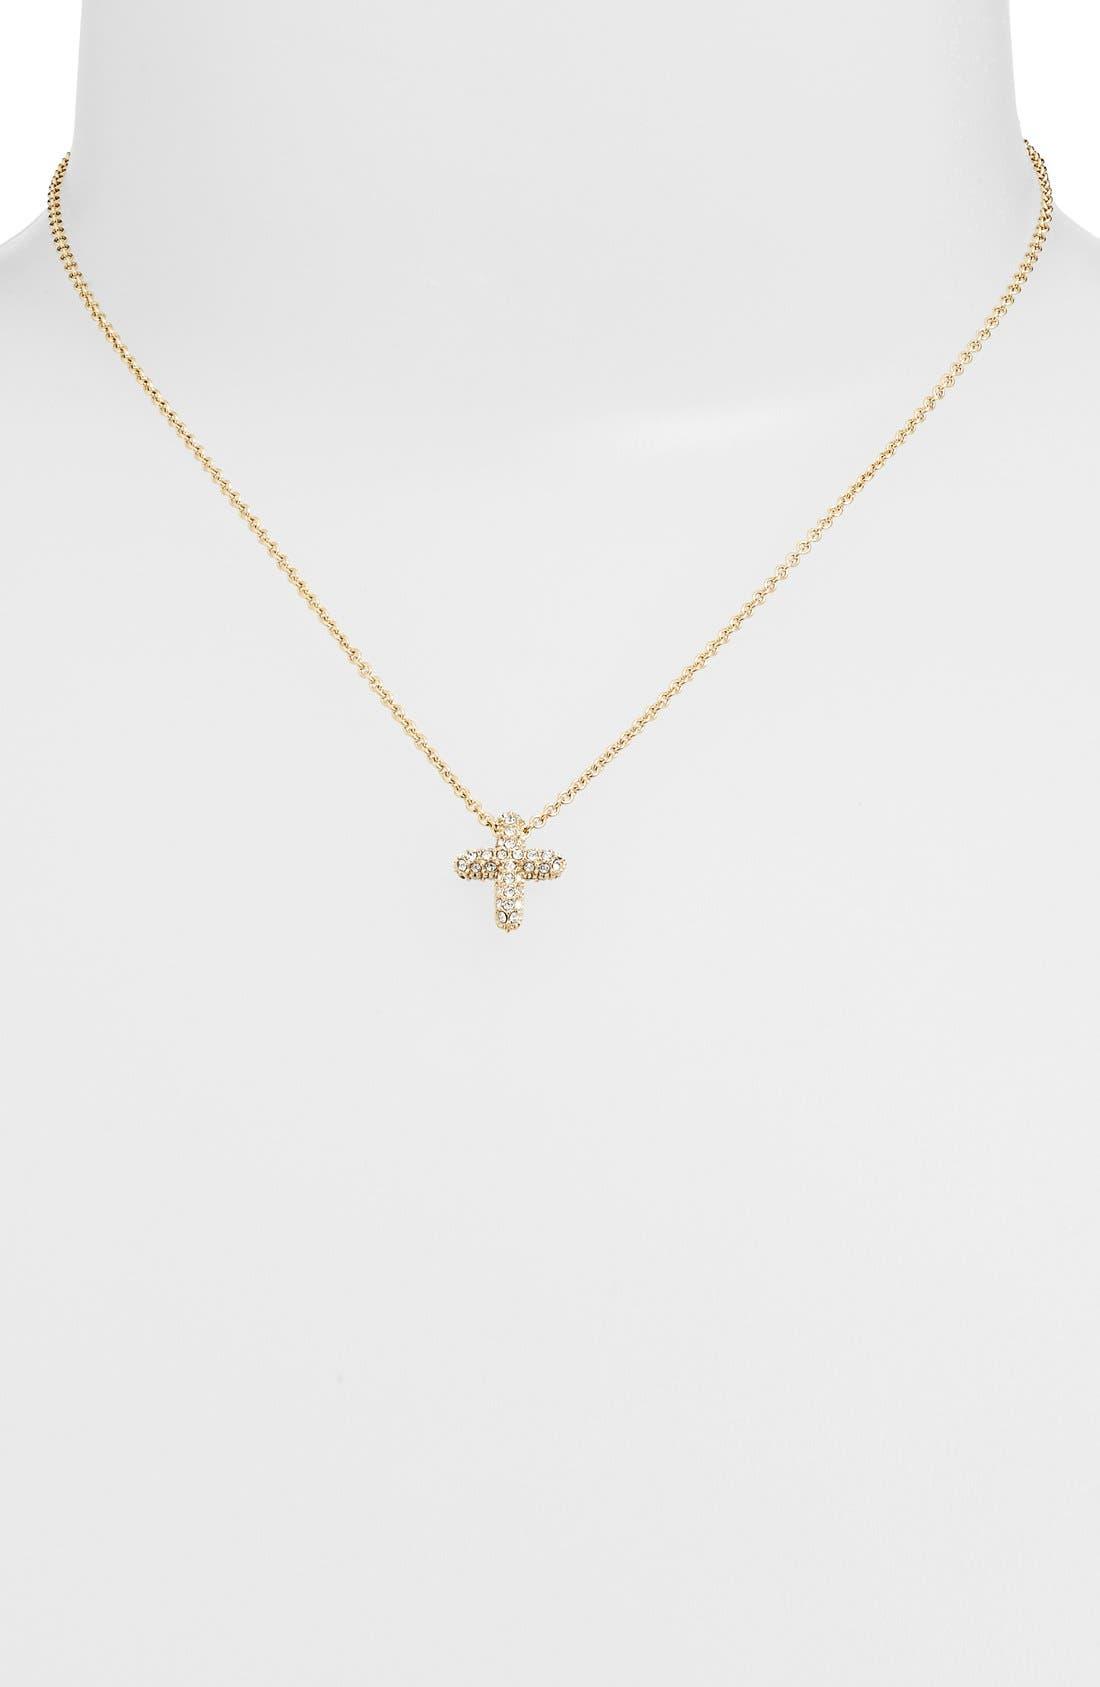 Alternate Image 1 Selected - Judith Jack Reversible Pavé Cross Pendant Necklace